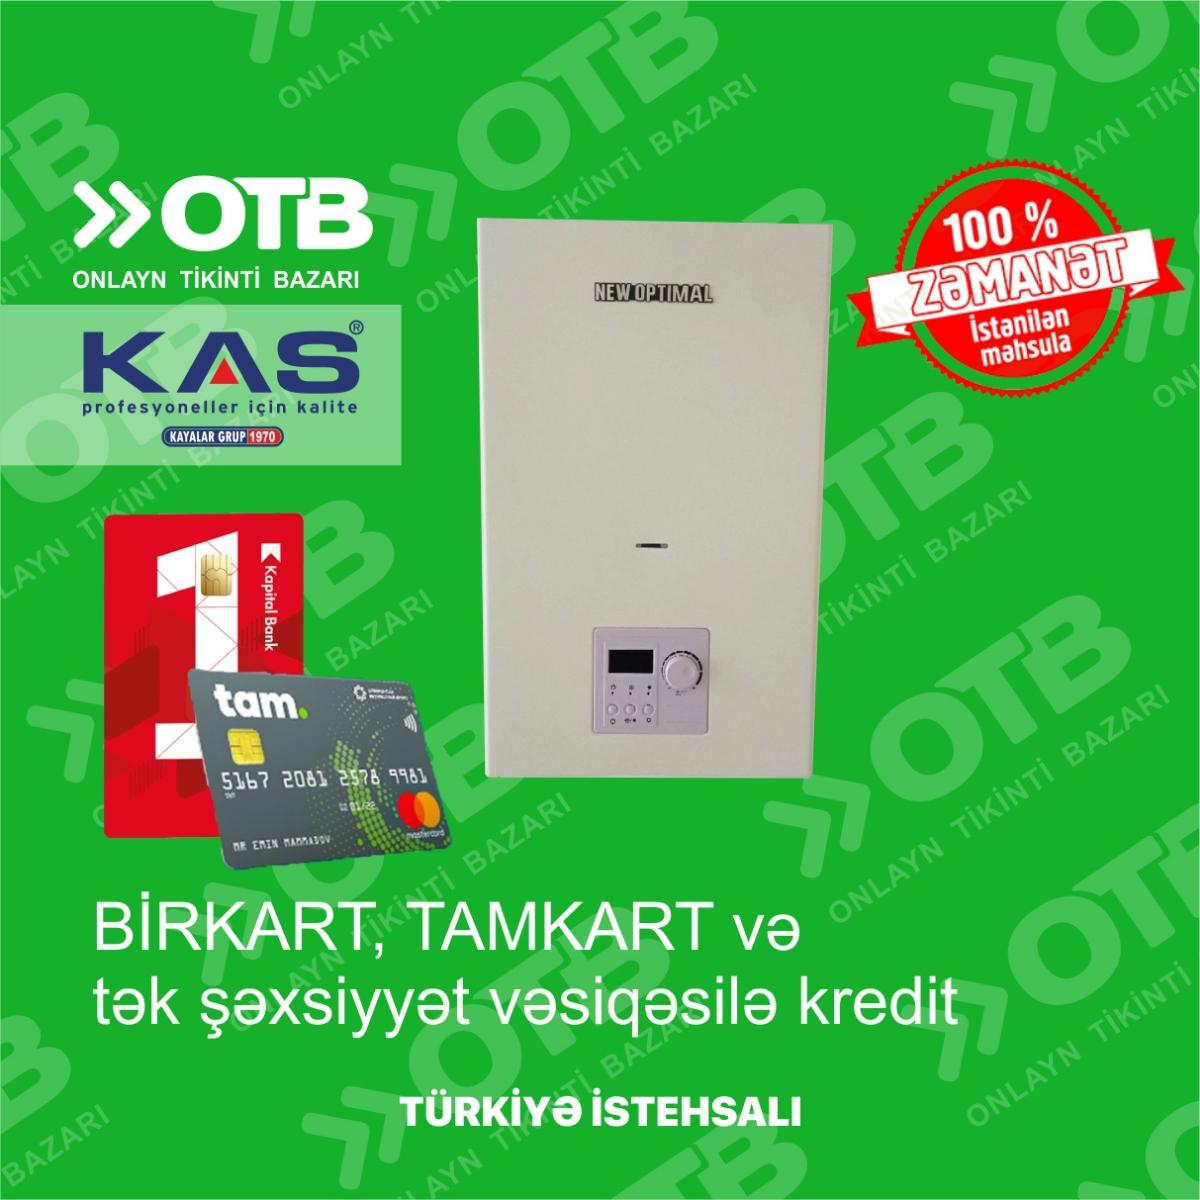 KAS TURKEY